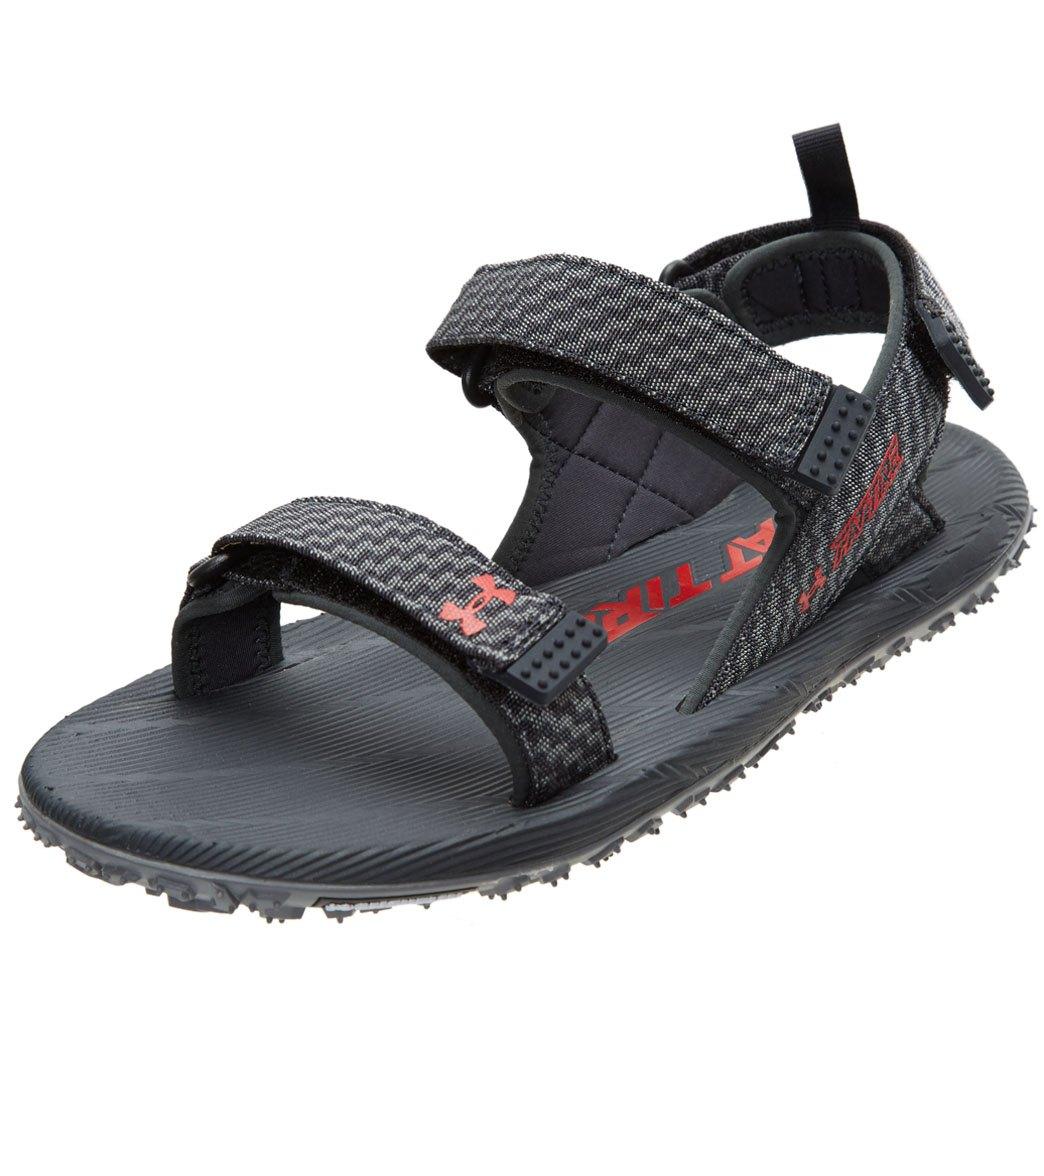 4a30d6d2f8b3 Under Armour Men s Fat Tire Sandal at SwimOutlet.com - Free Shipping